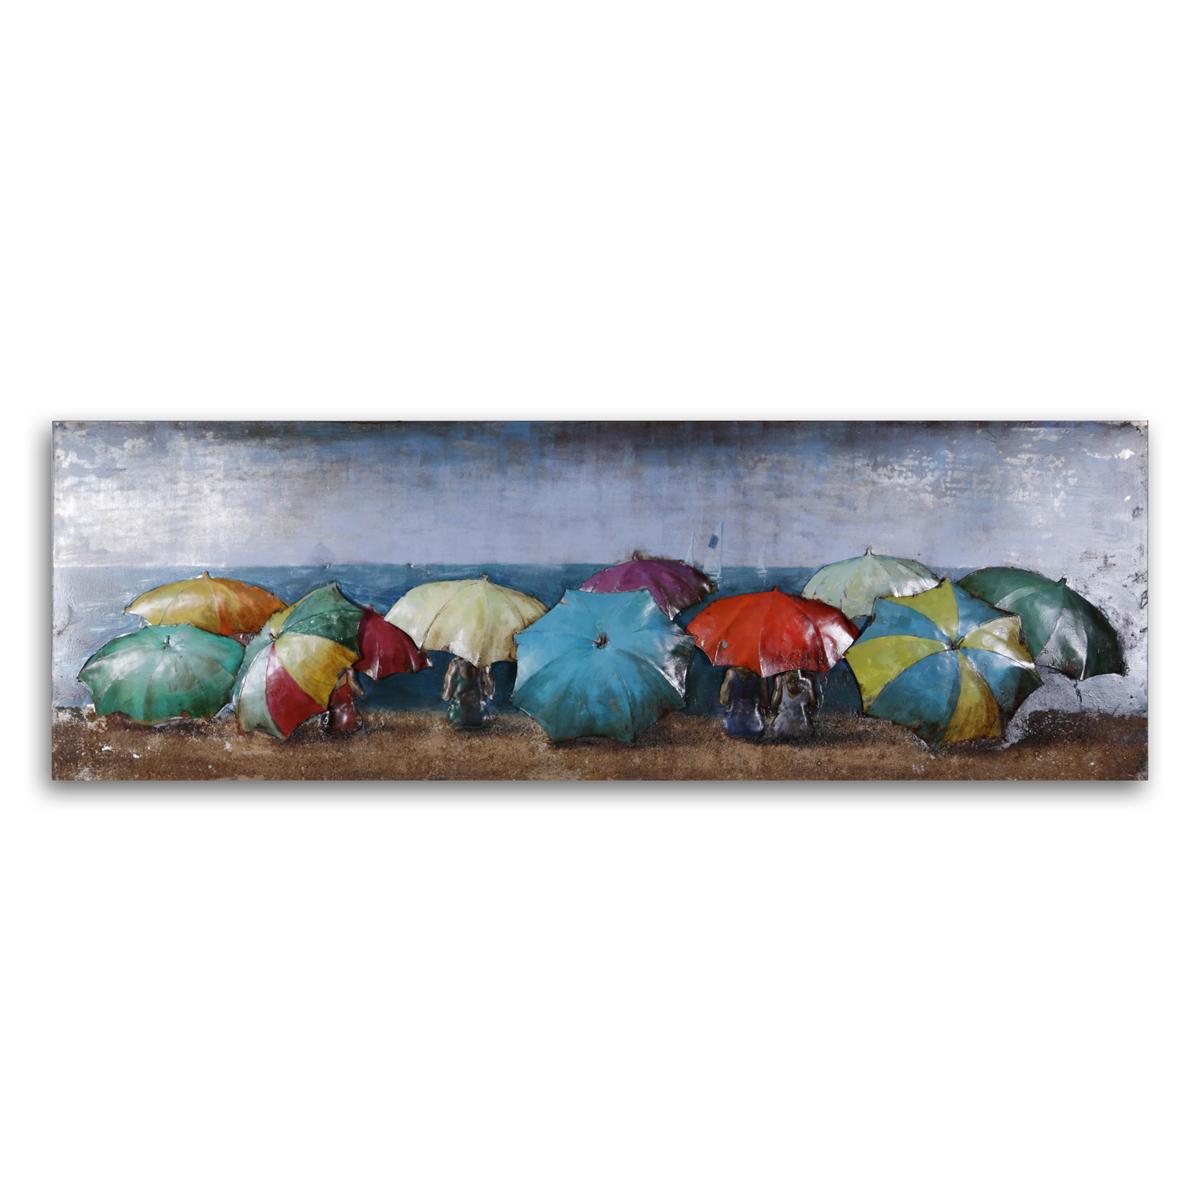 Beach Wall Art: Beach Umbrellas Metal Wall Art Within Most Popular Bella Beach Umbrellas (Gallery 13 of 20)